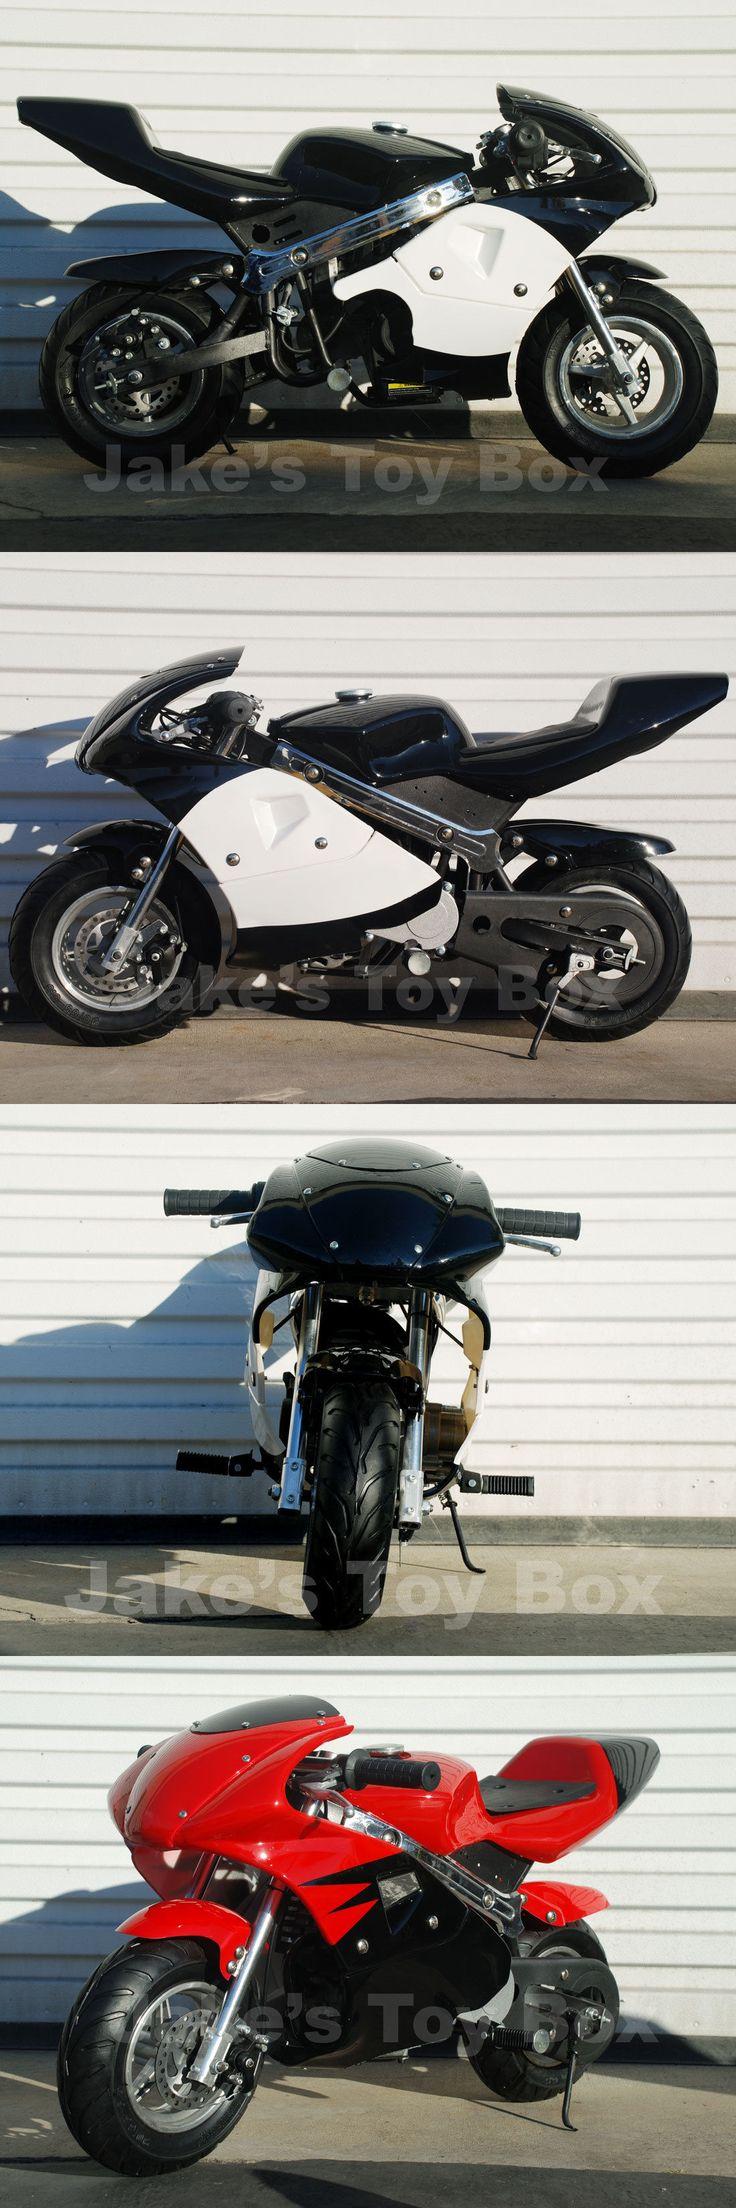 Gas Scooters 75211: 40Cc Pocket Bike Gas Powered Ninja Mini Bike Kids - Black BUY IT NOW ONLY: $290.0